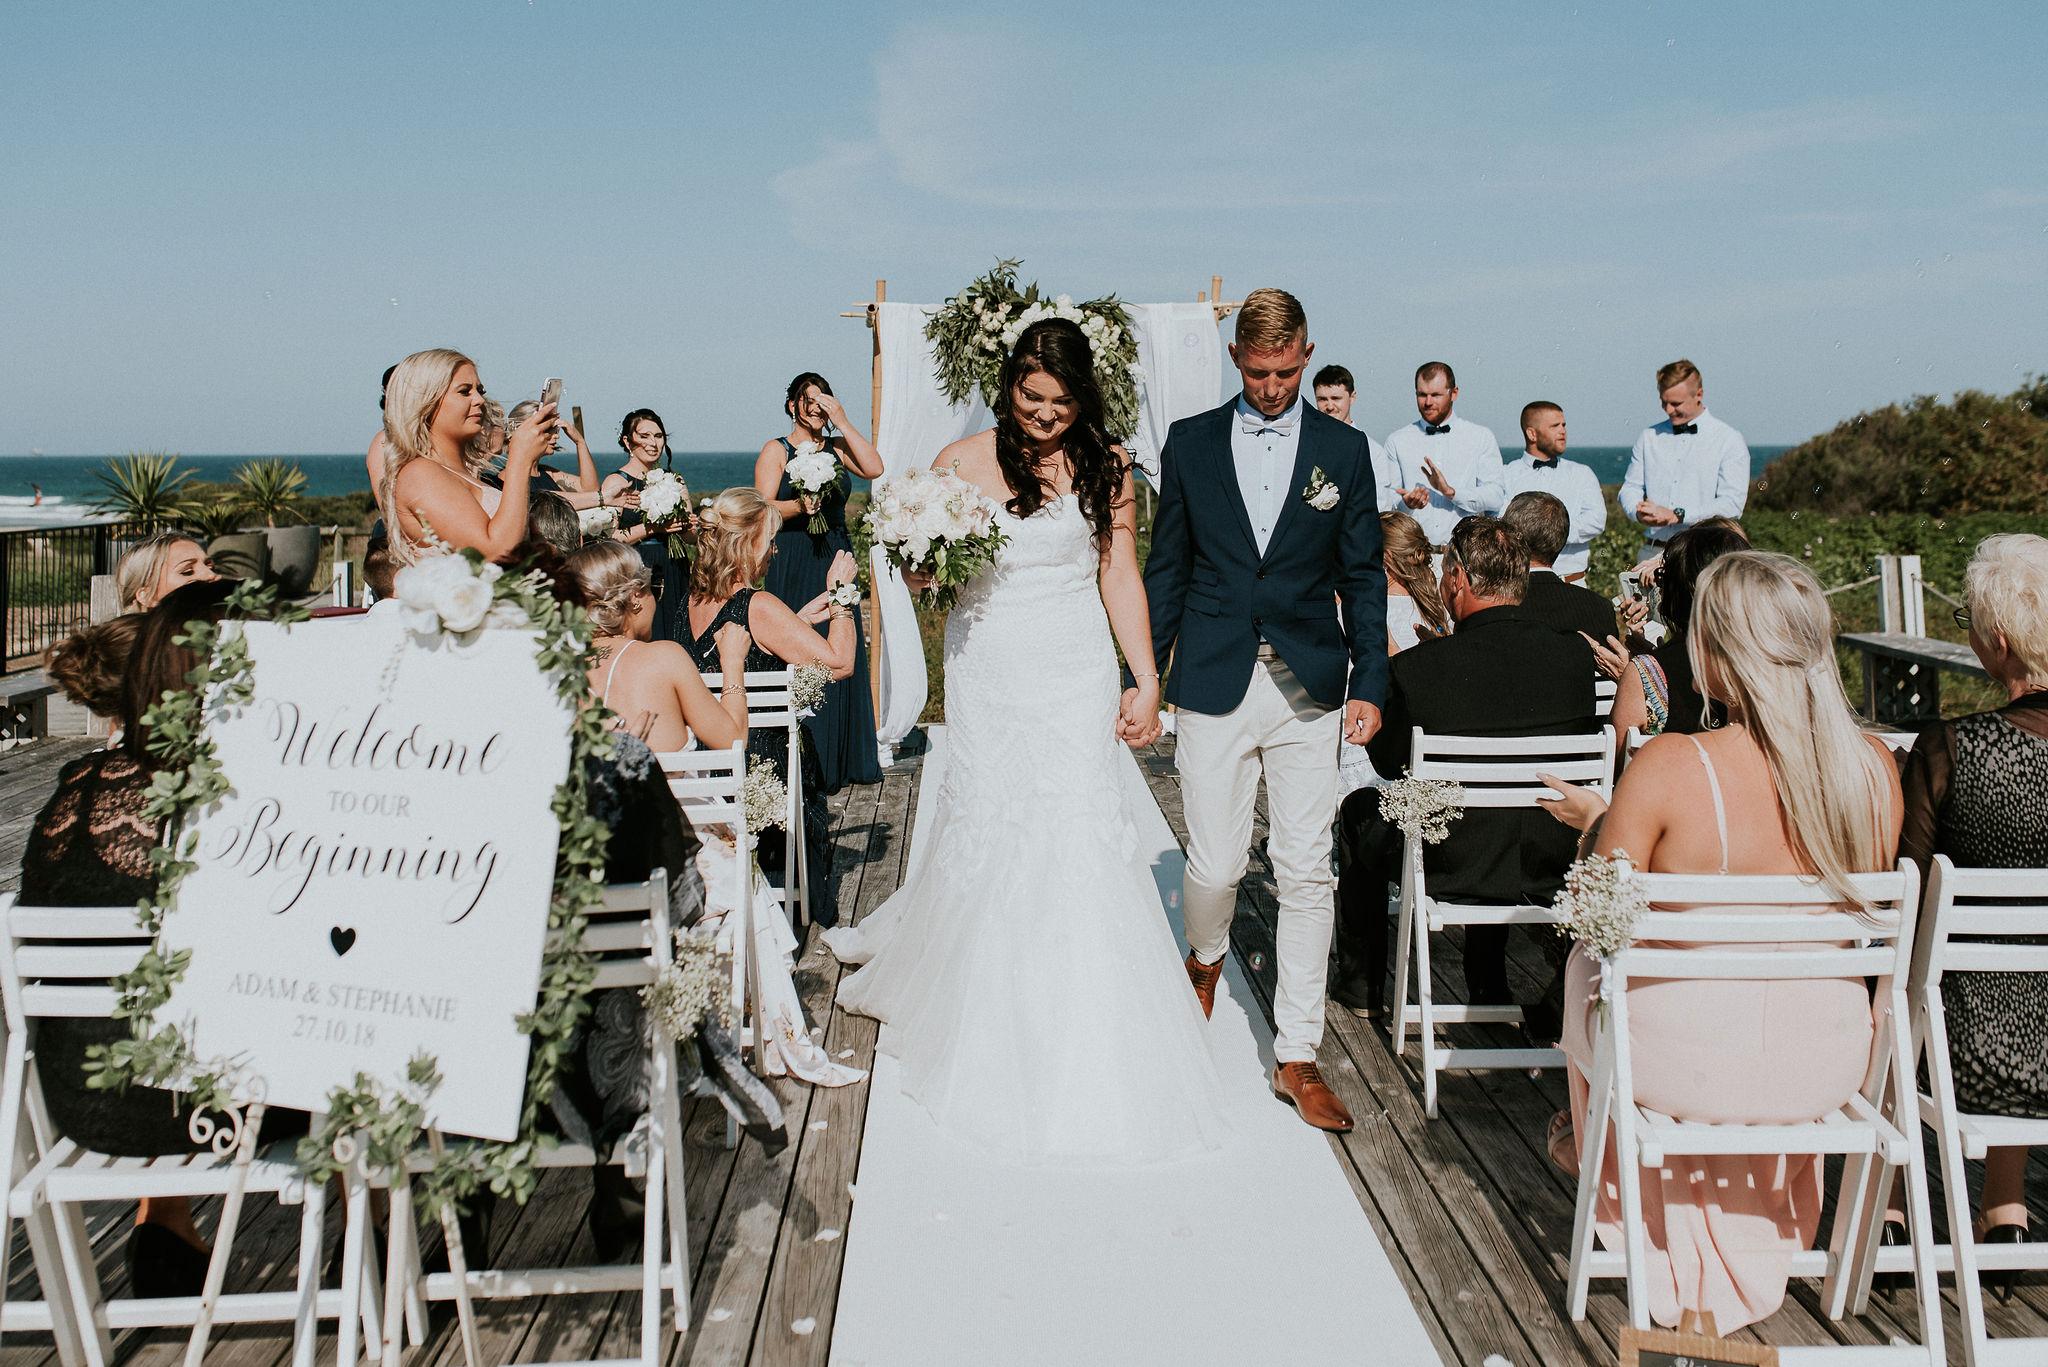 CAVES-BEACH-HOTEL-WEDDING-PATTEN-476.jpg